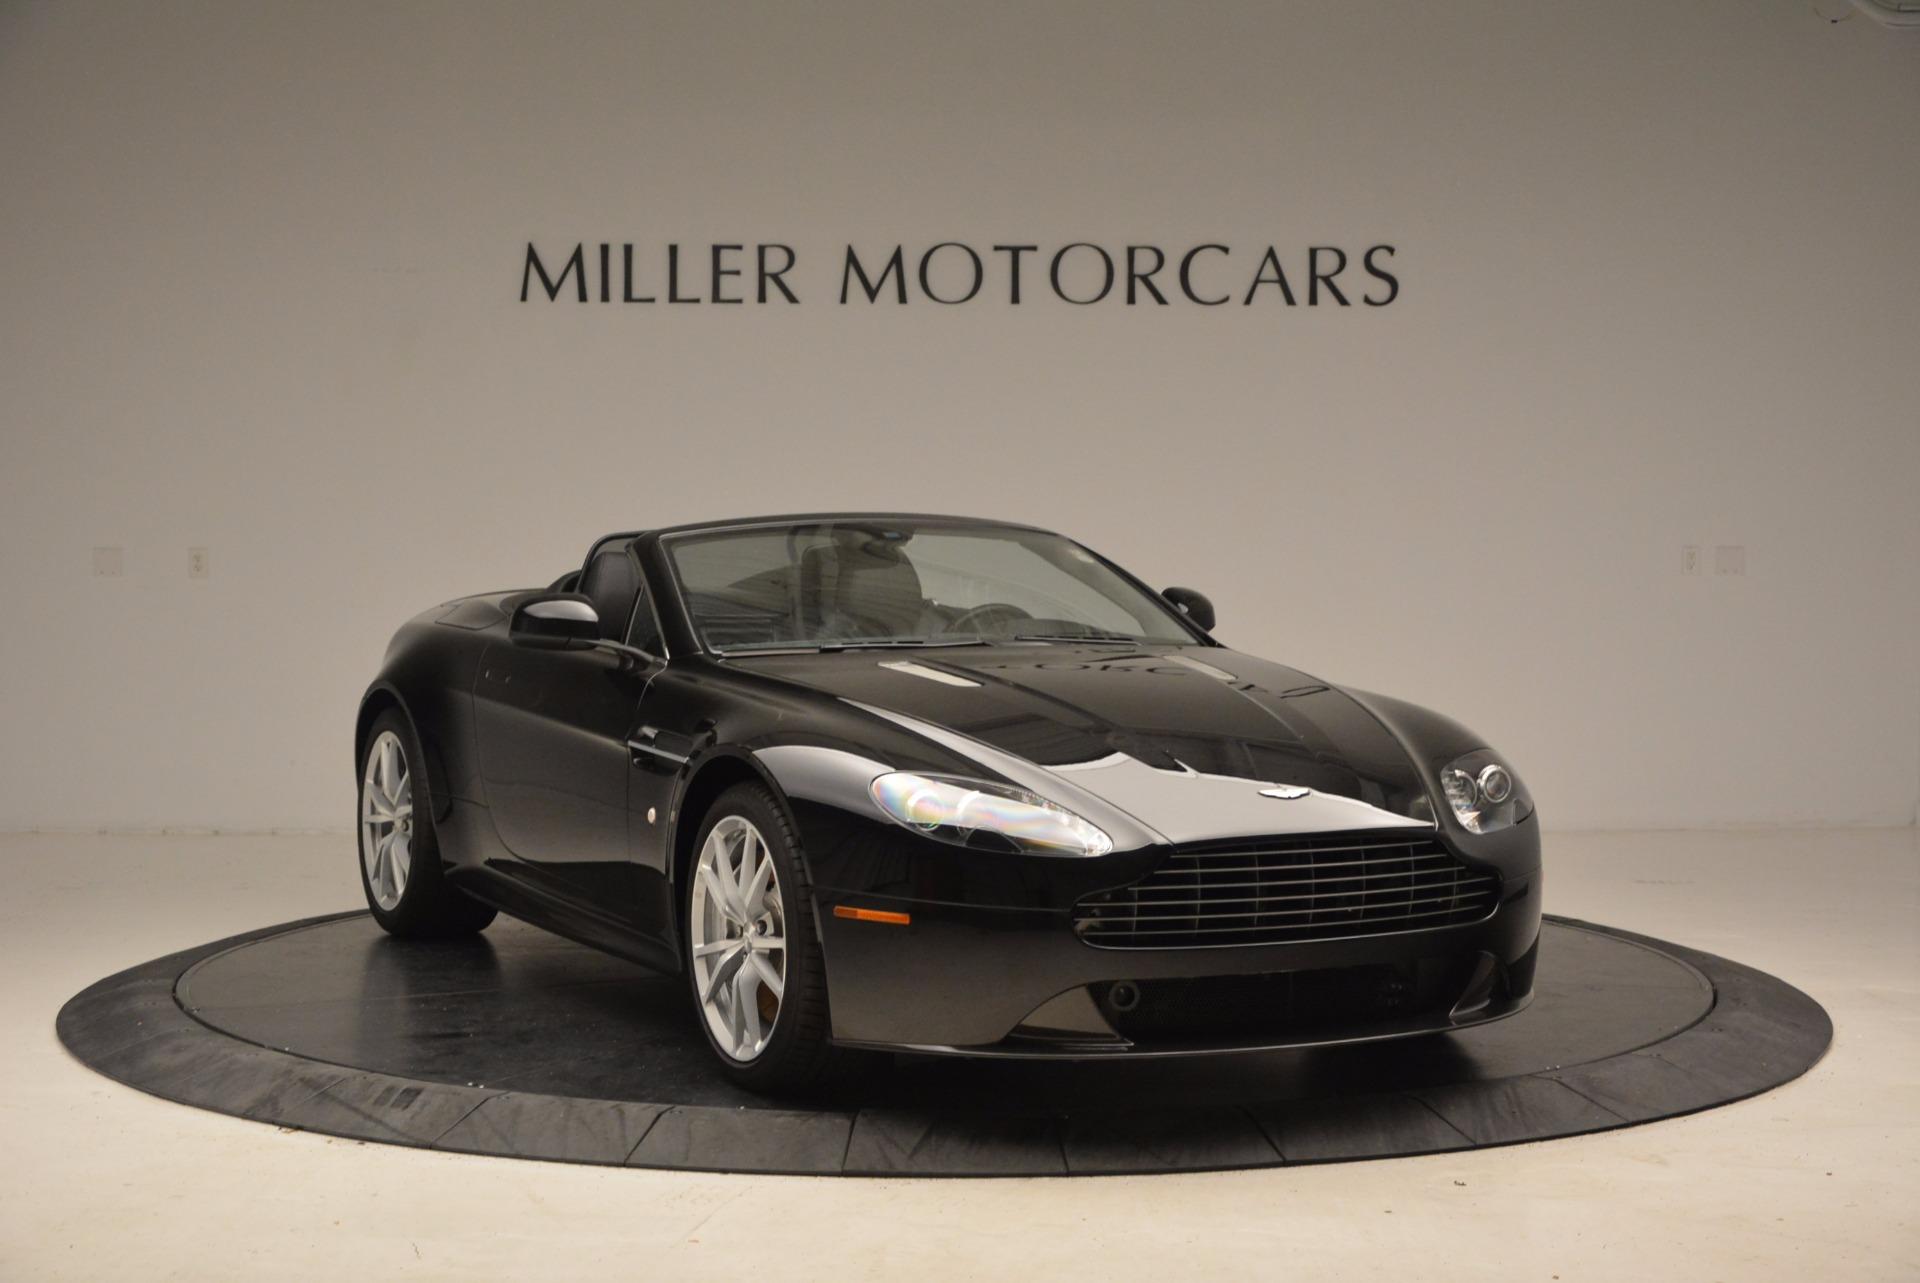 New-2016-Aston-Martin-V8-Vantage-Roadster